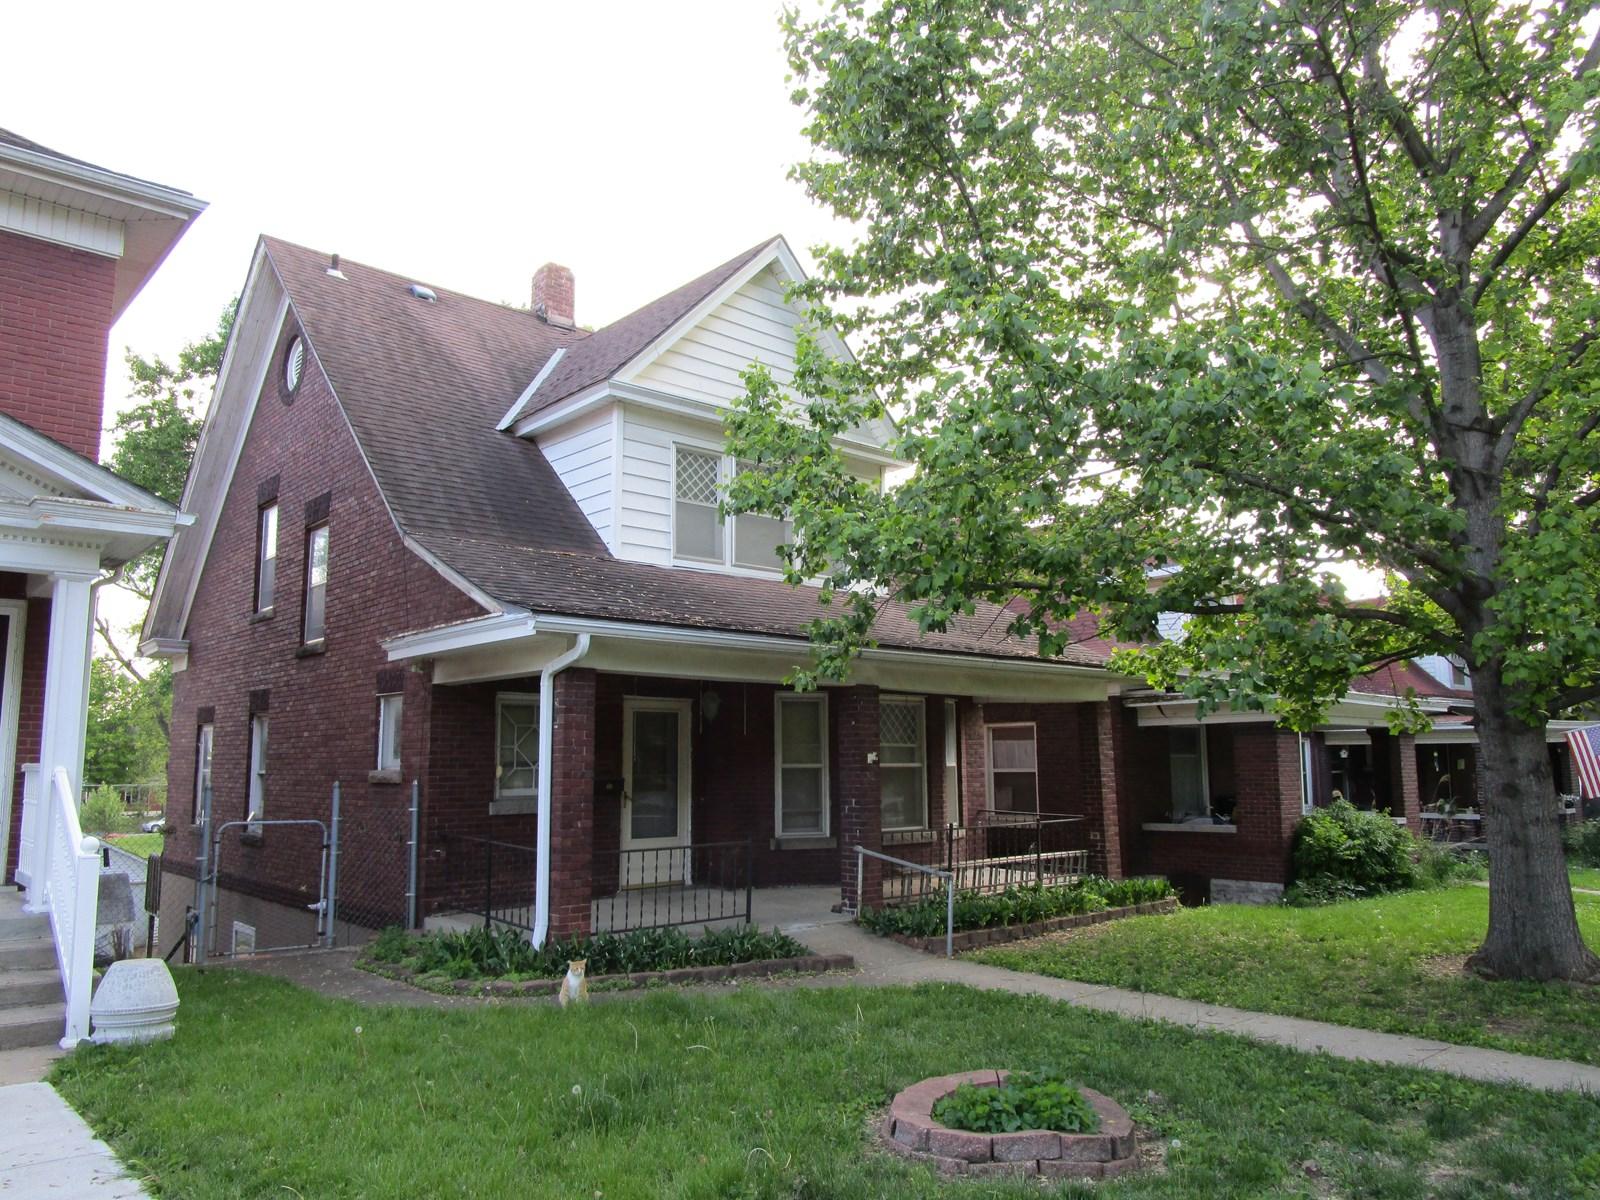 2 Story Brick Home Atchison KS